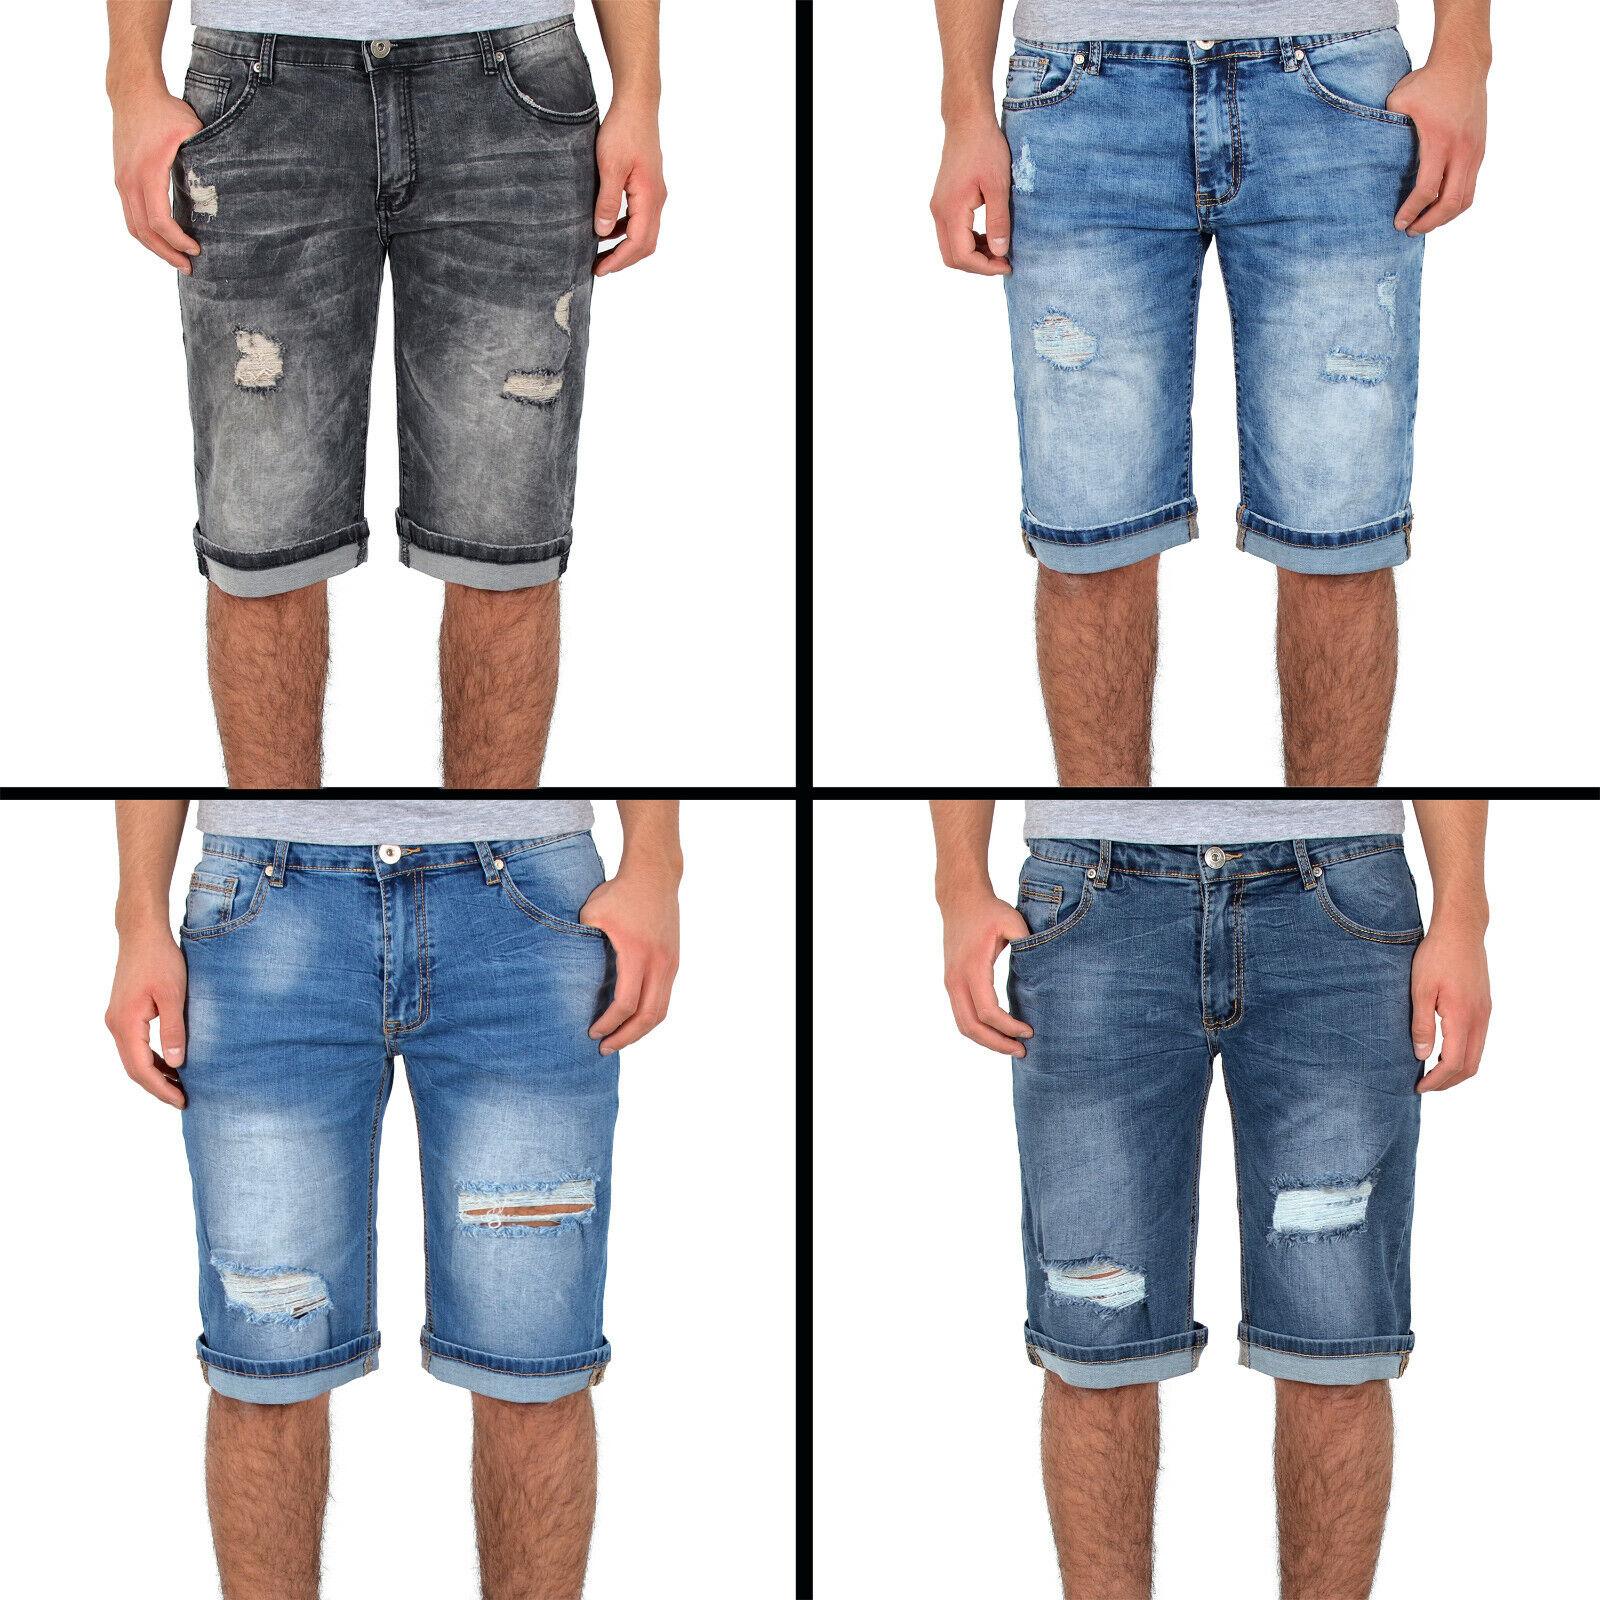 Damen Caprijeans 3//4 Hüfthose Capri Hose Used Destroyed Risse Loch Bermuda Jeans